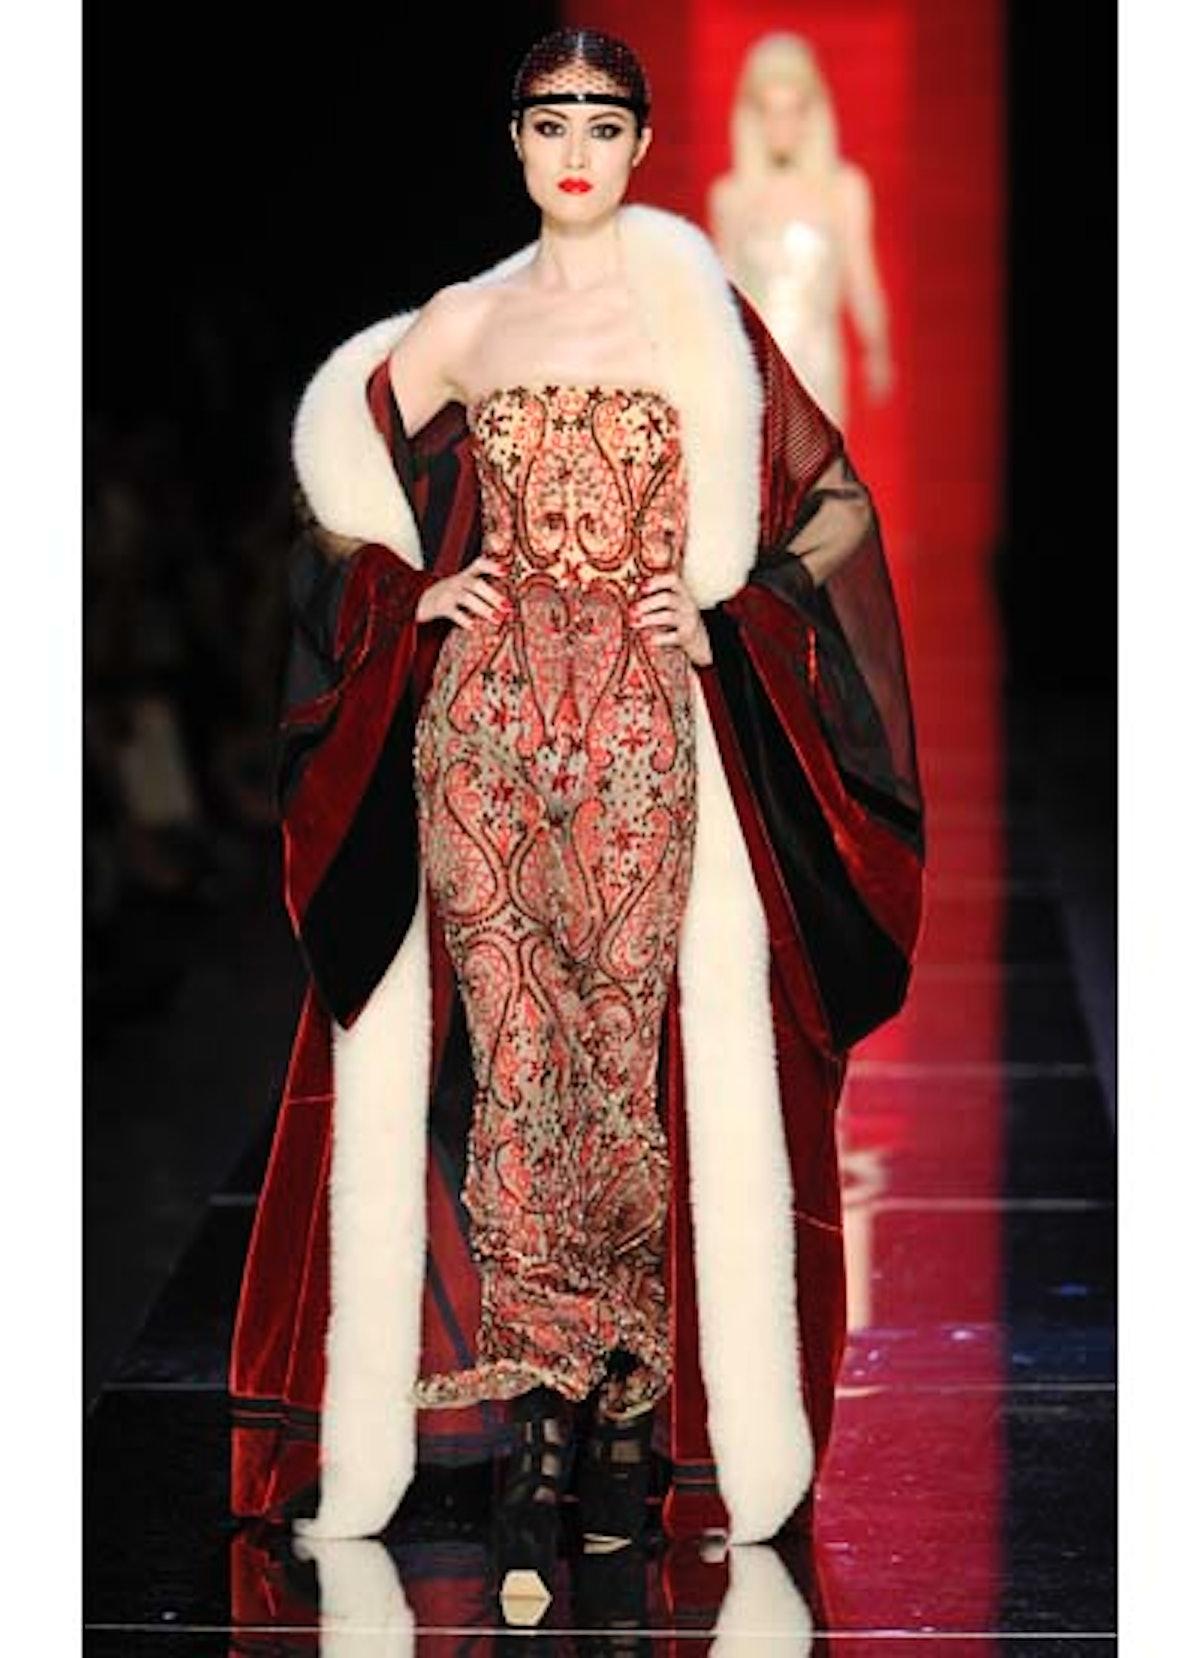 fass-jean-paul-gaultier-couture-2012-runway-54-v.jpg